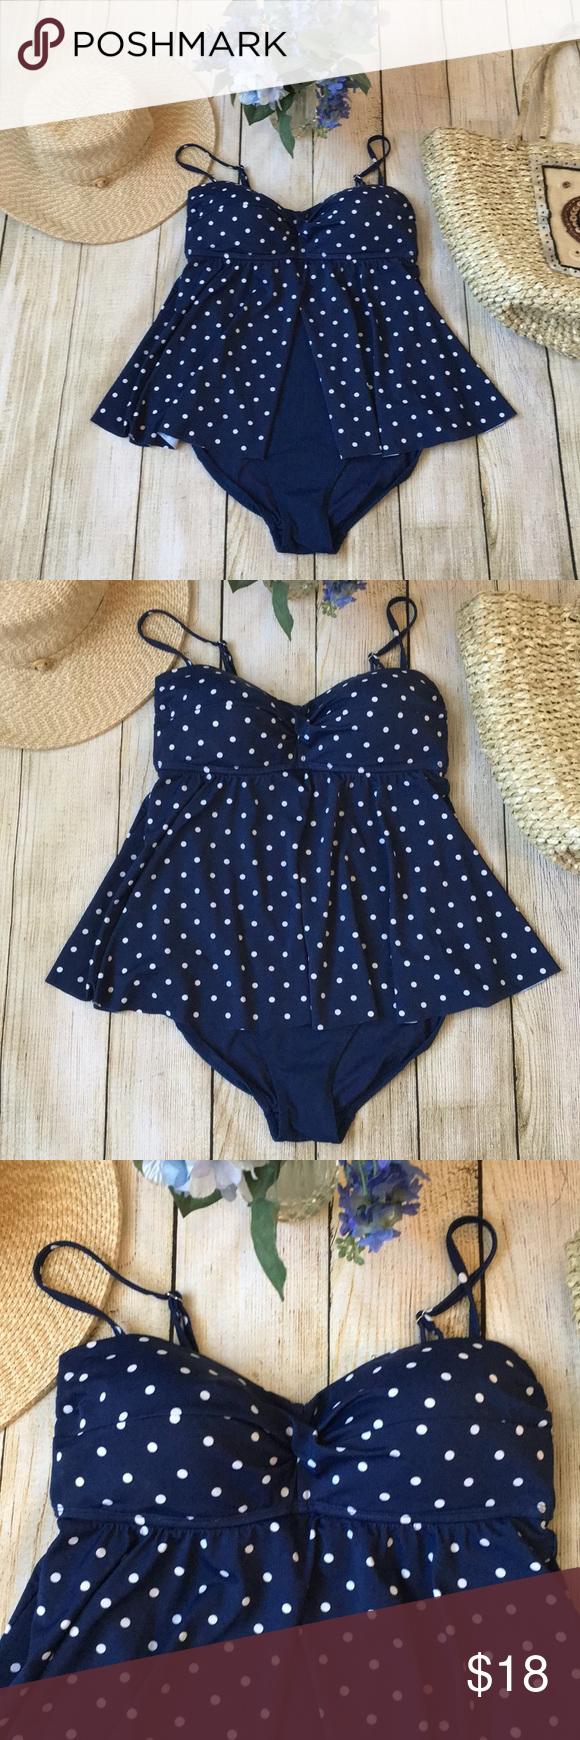 Tropical Escape Womens Black White Polka Dot 1 Piece Swimming Suit Single Strap Bathing Dress 18